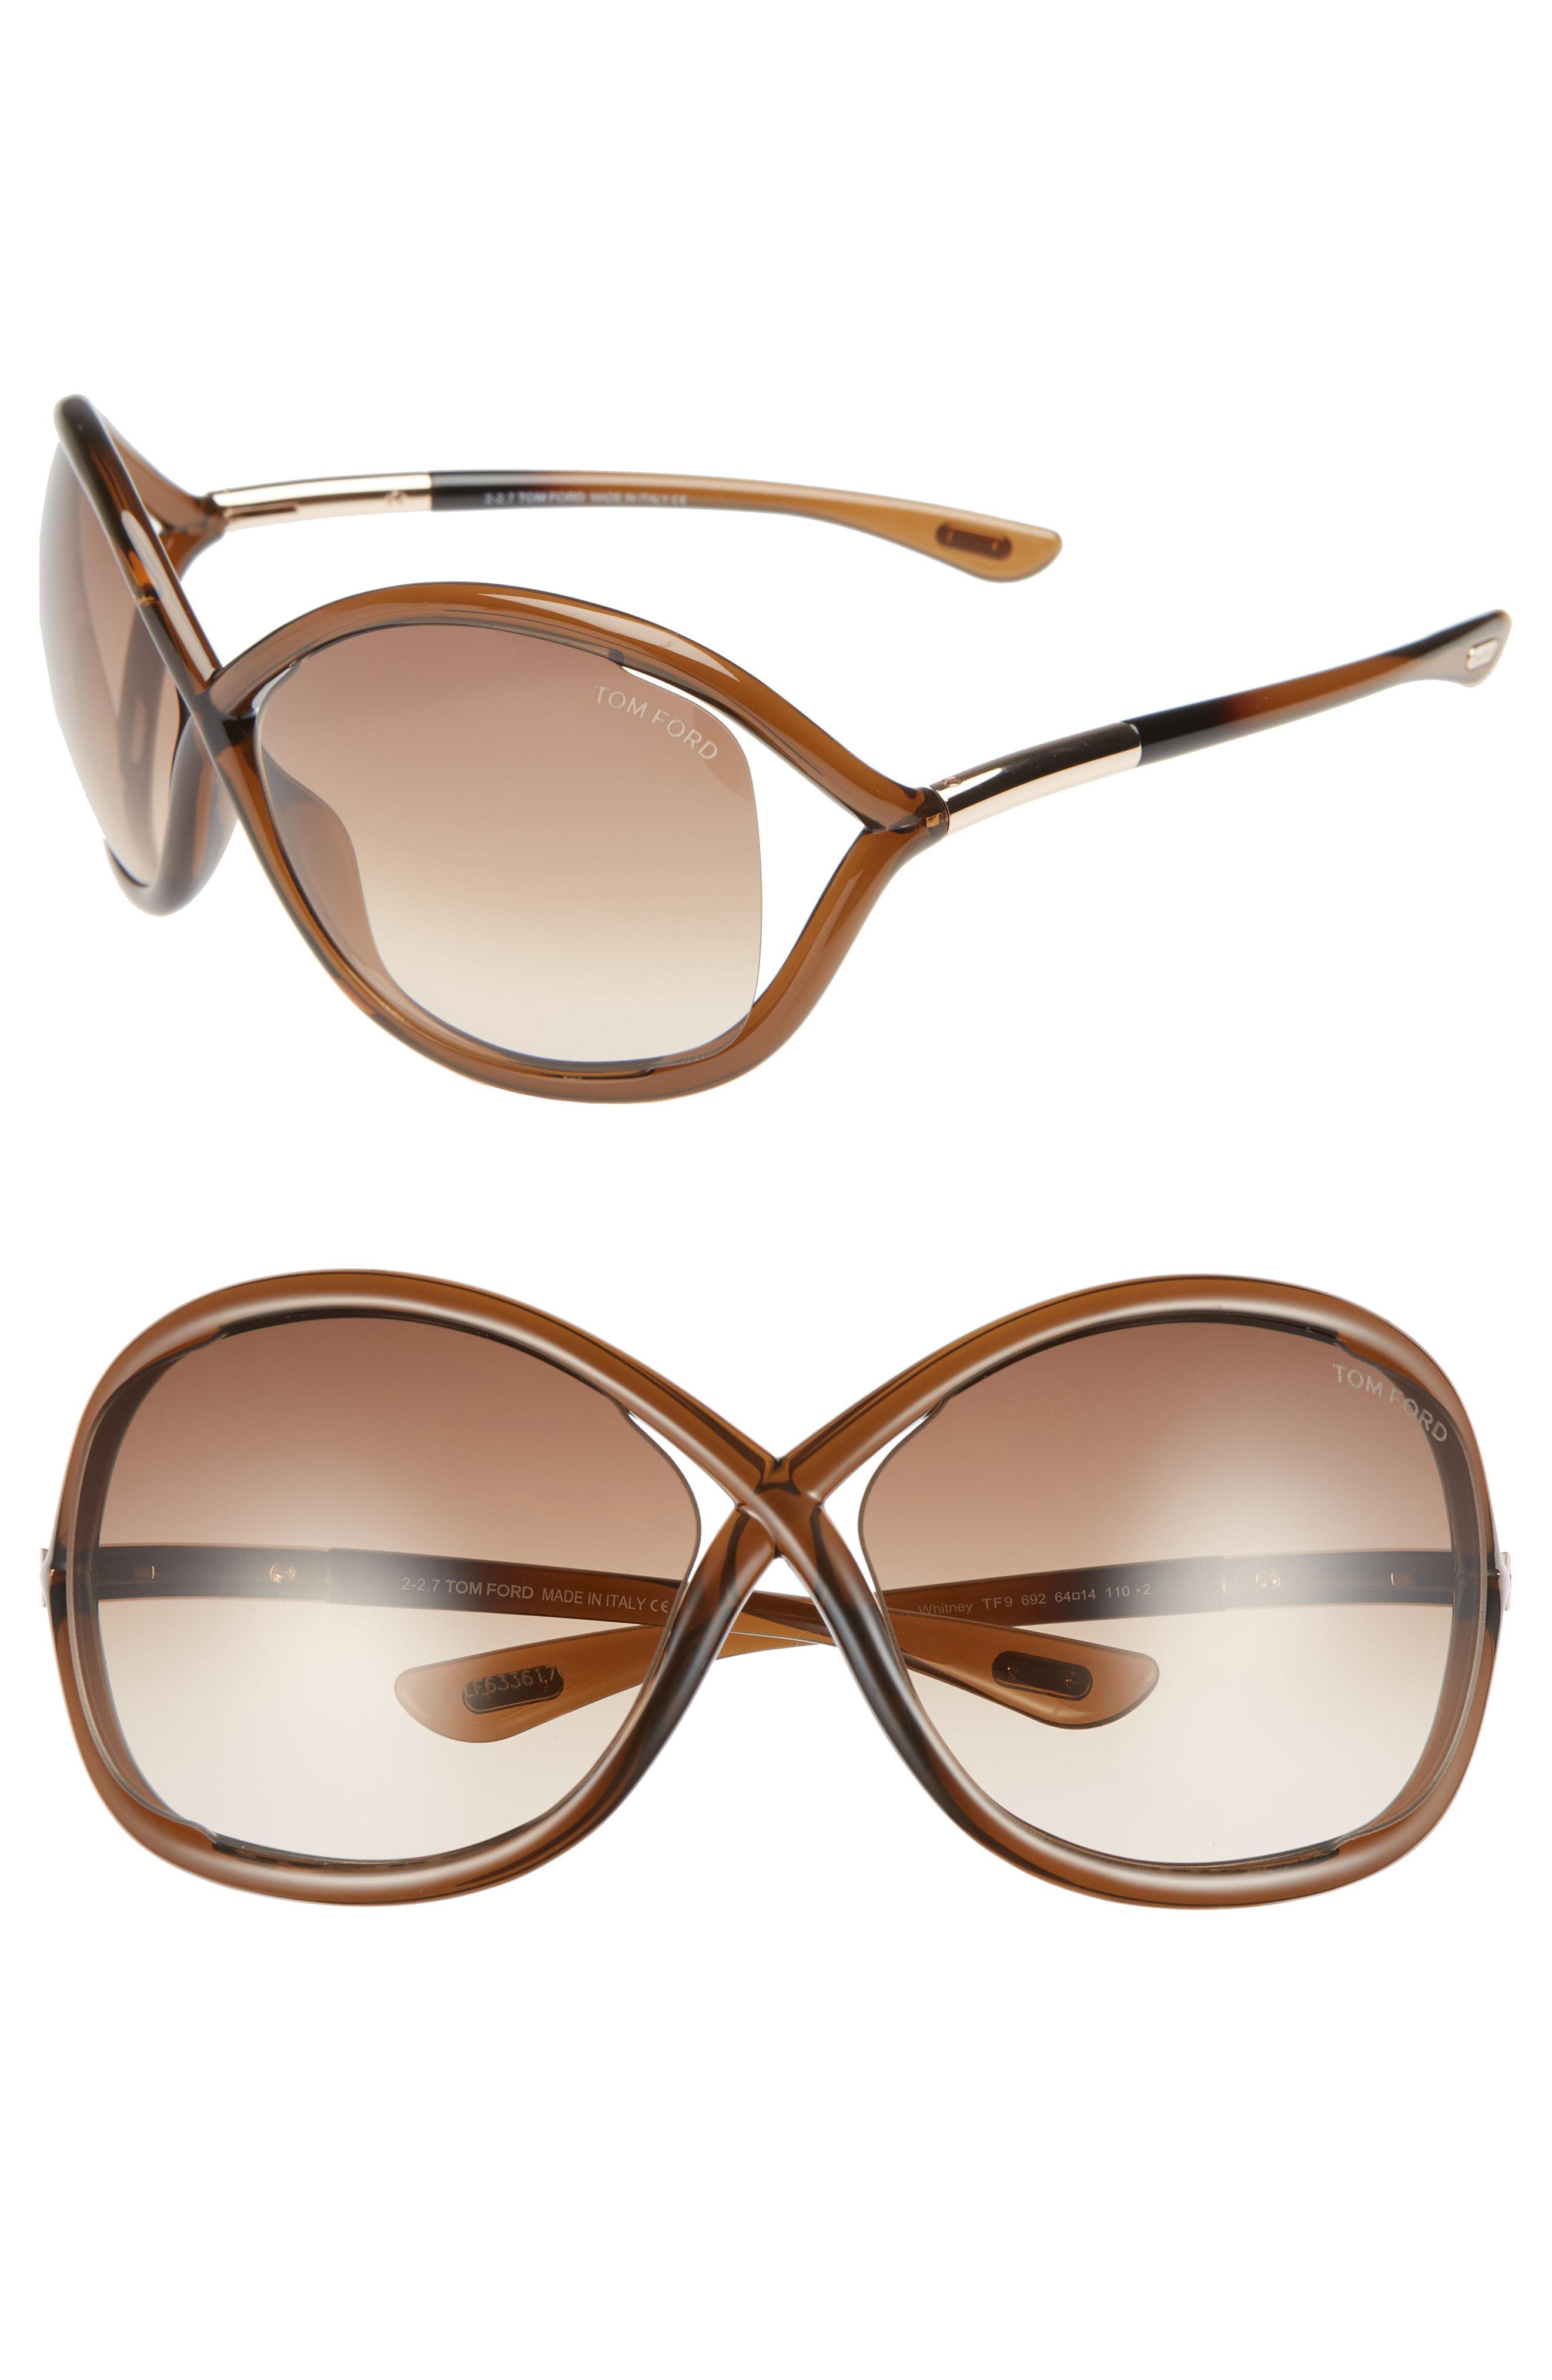 8a5ec9784e3 Tom Ford -  whitney  64mm Open Side Sunglasses - Dark Brown - Lyst. View  fullscreen